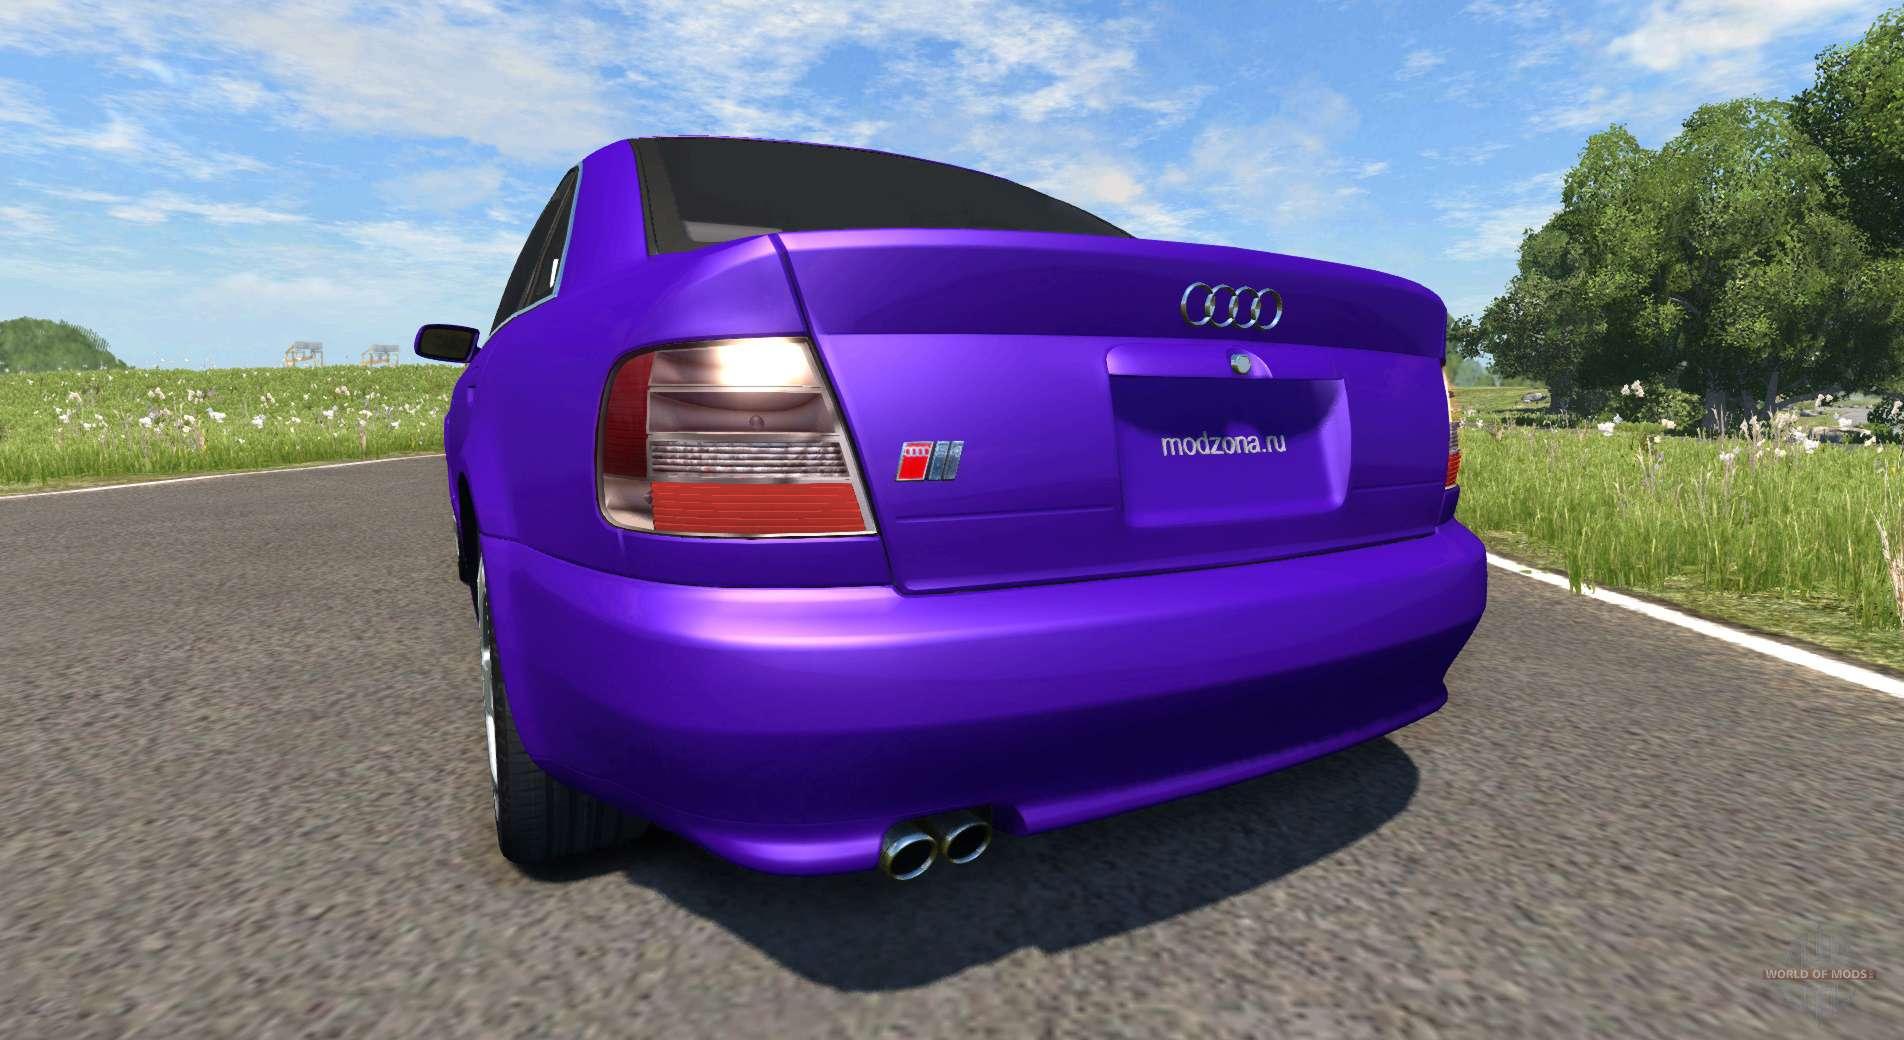 Image result for pantone purple car